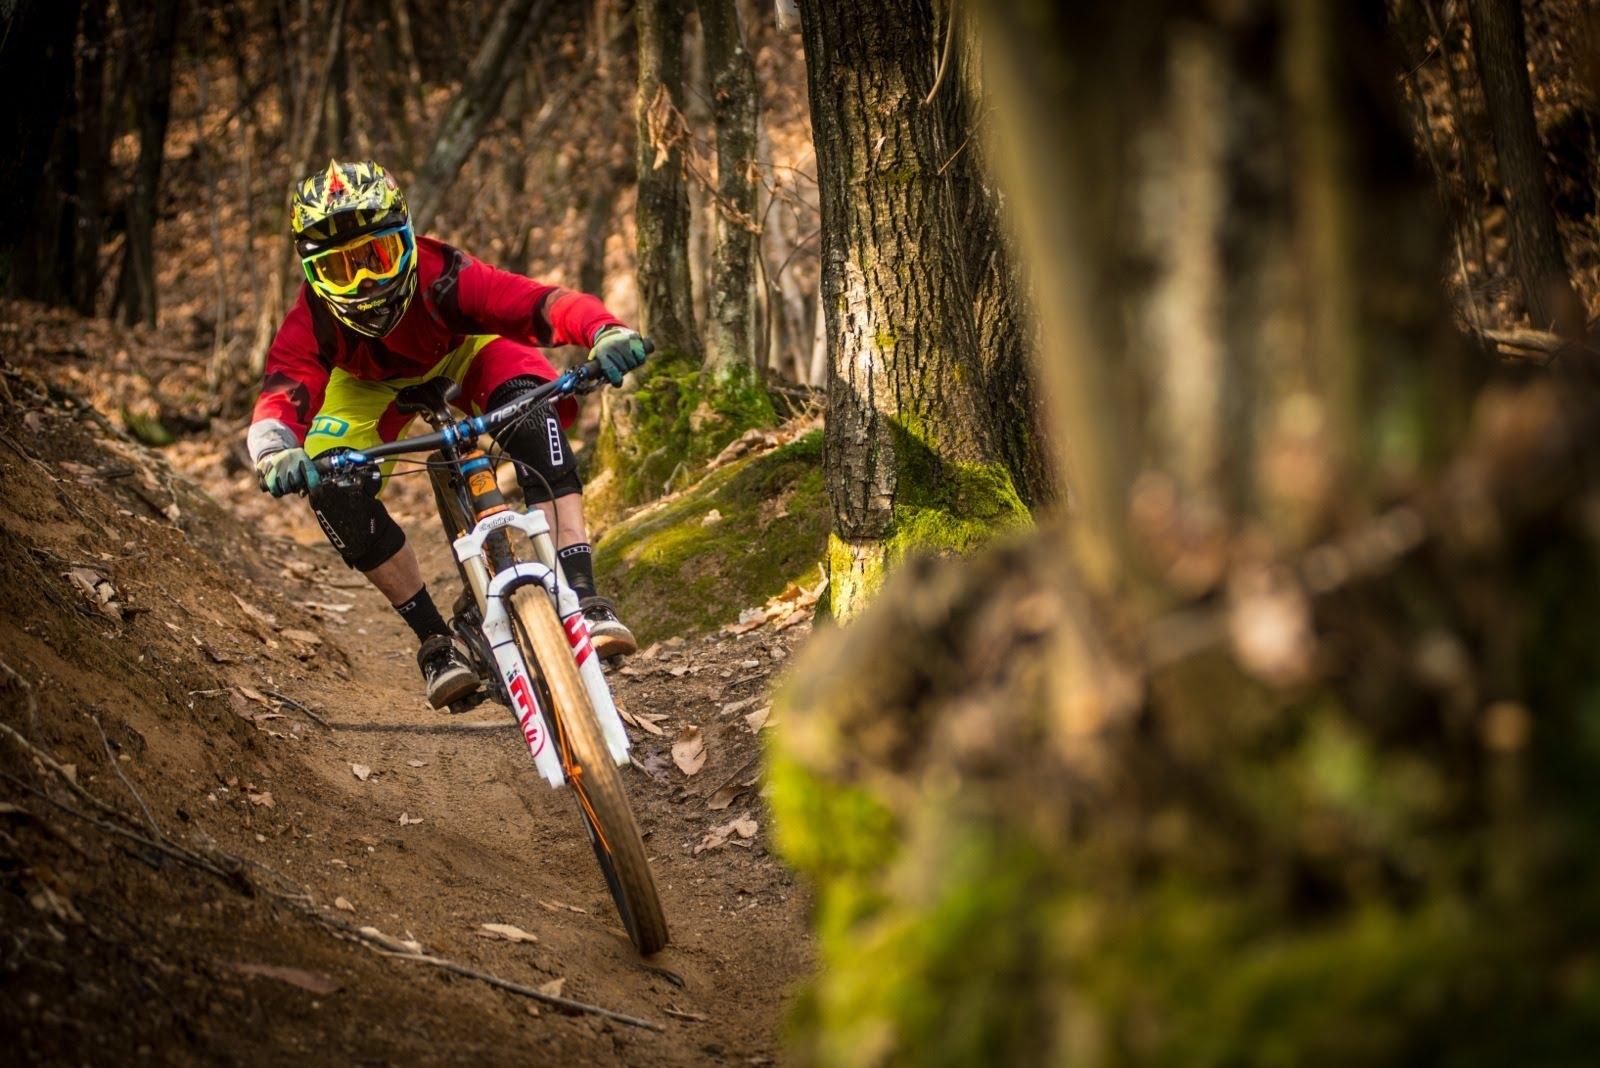 Davide-Sottocornola-un-semplice-biker.jpg